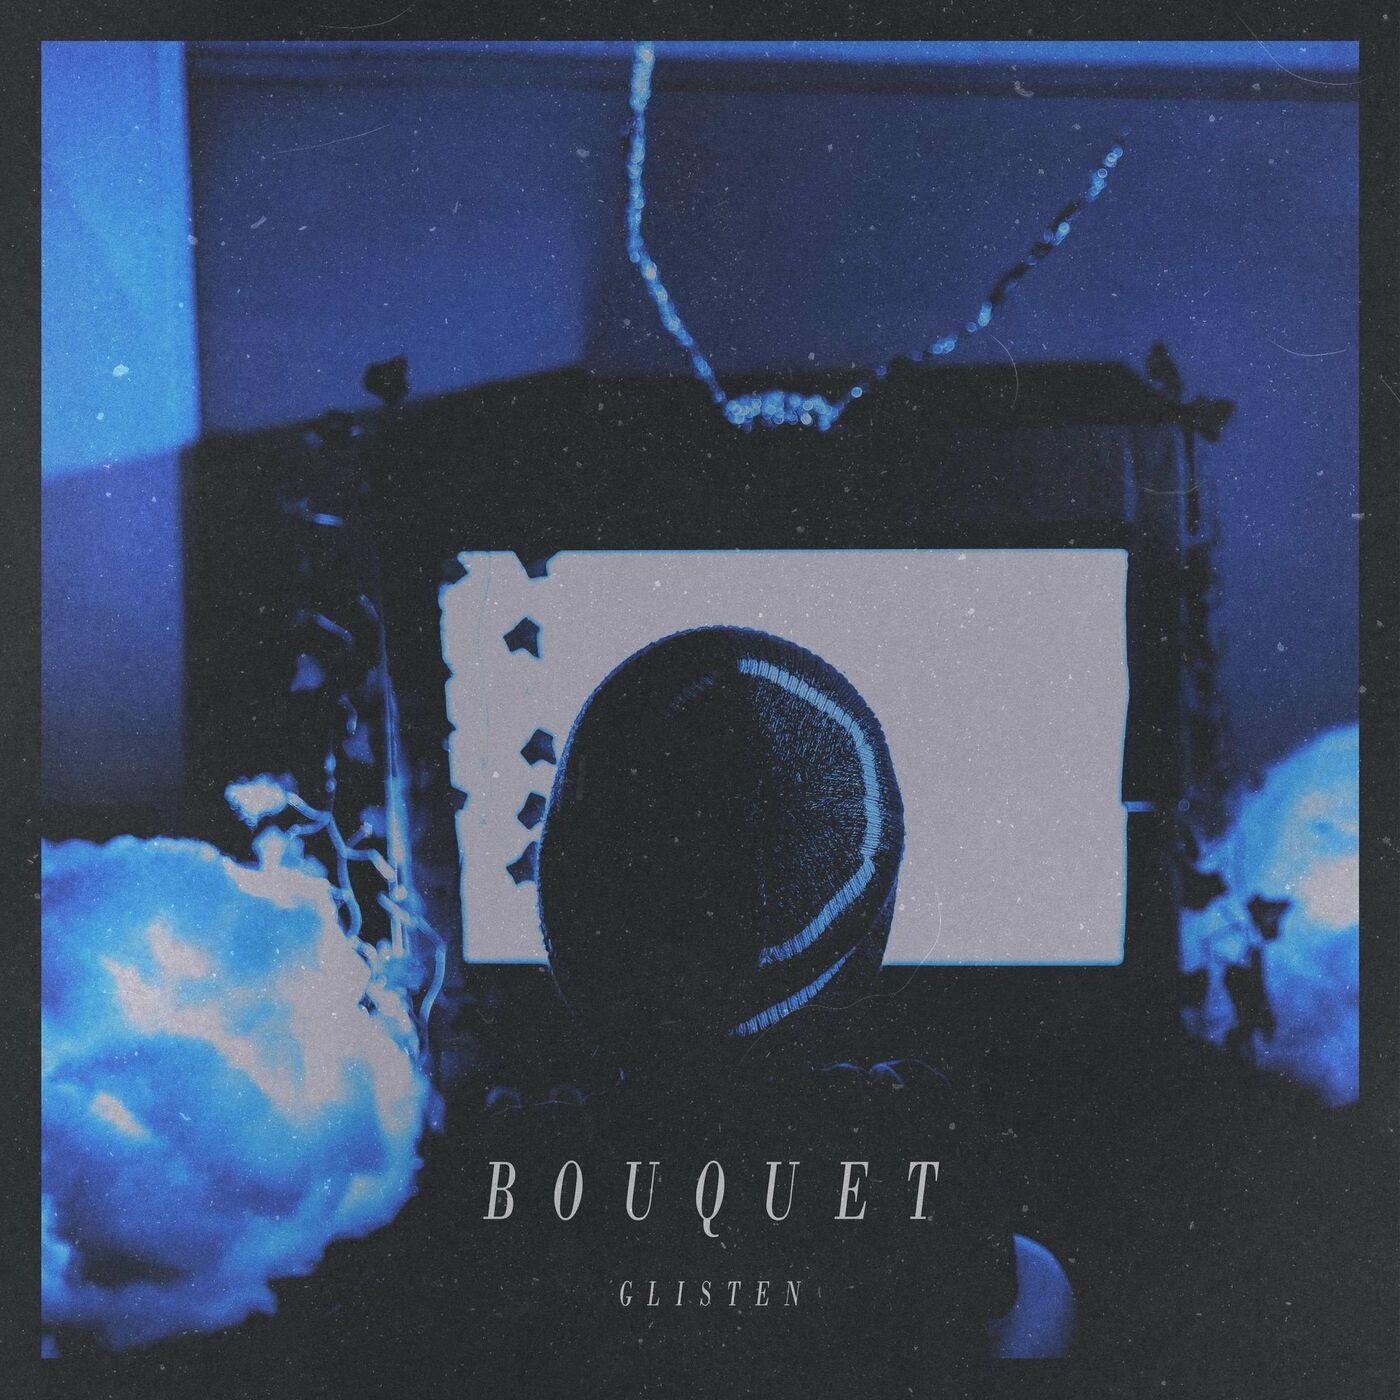 Bouquet - Glisten [single] (2021)